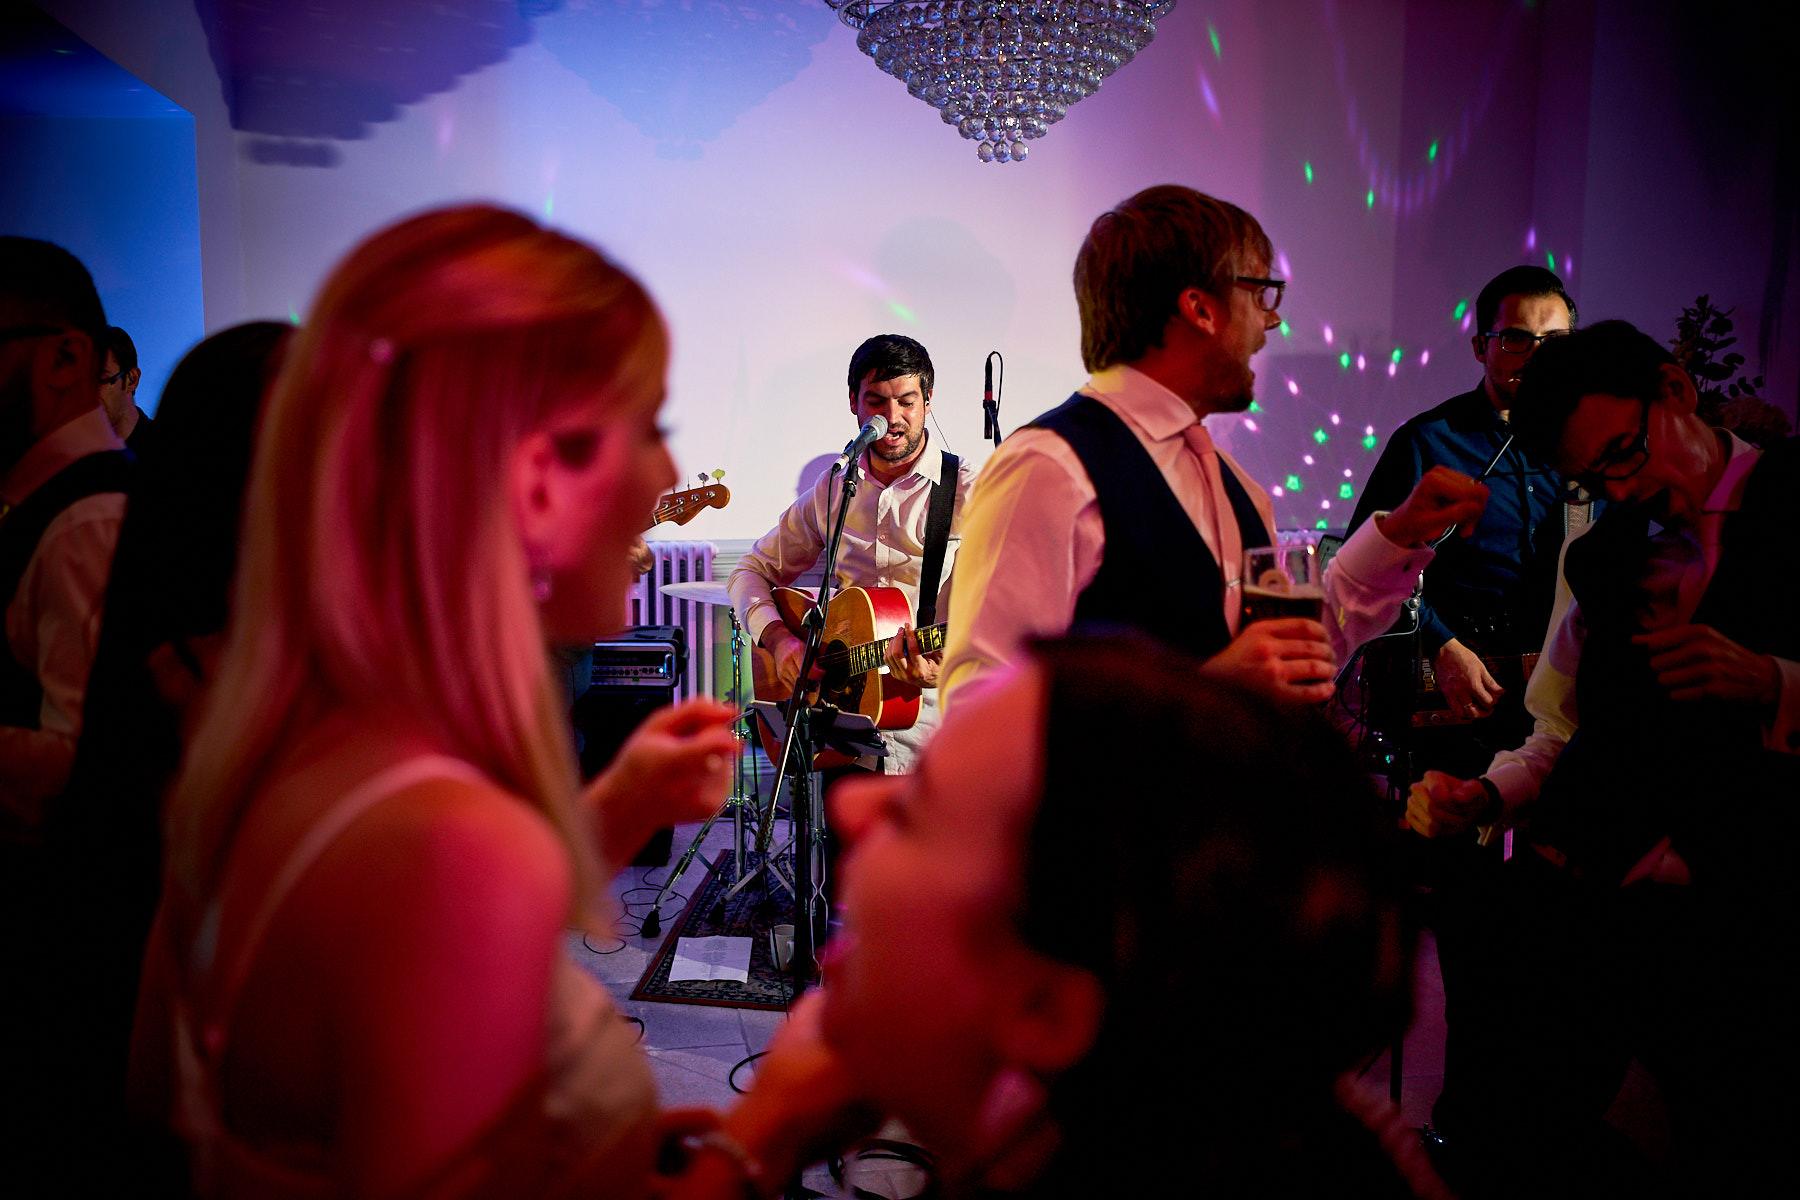 Marc Kenny playing live at Llangollen Wedding